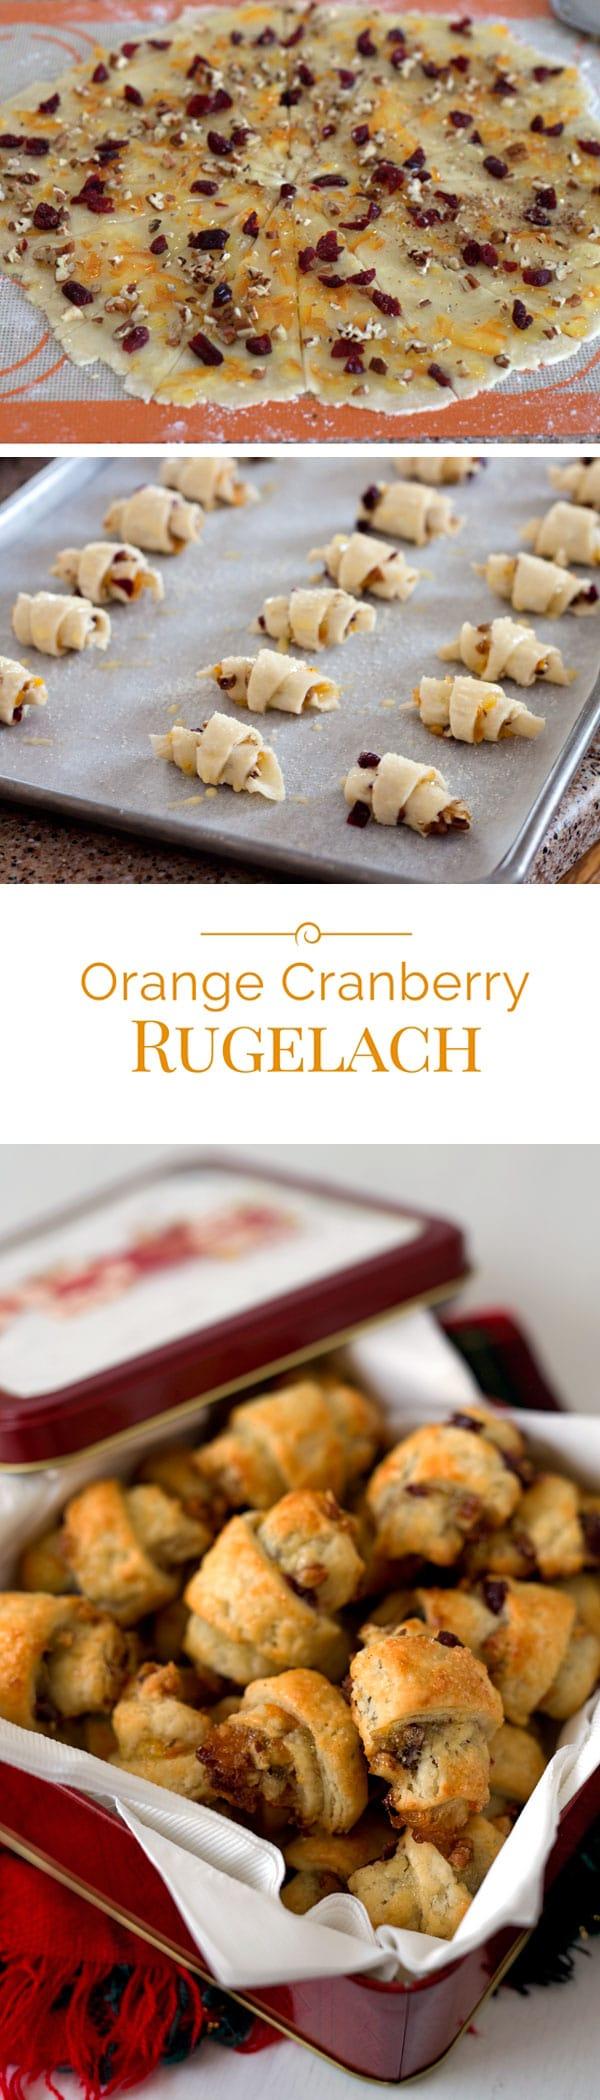 Orange-Cranberry-Rugelach-Collage-2-Barbara-Bakes